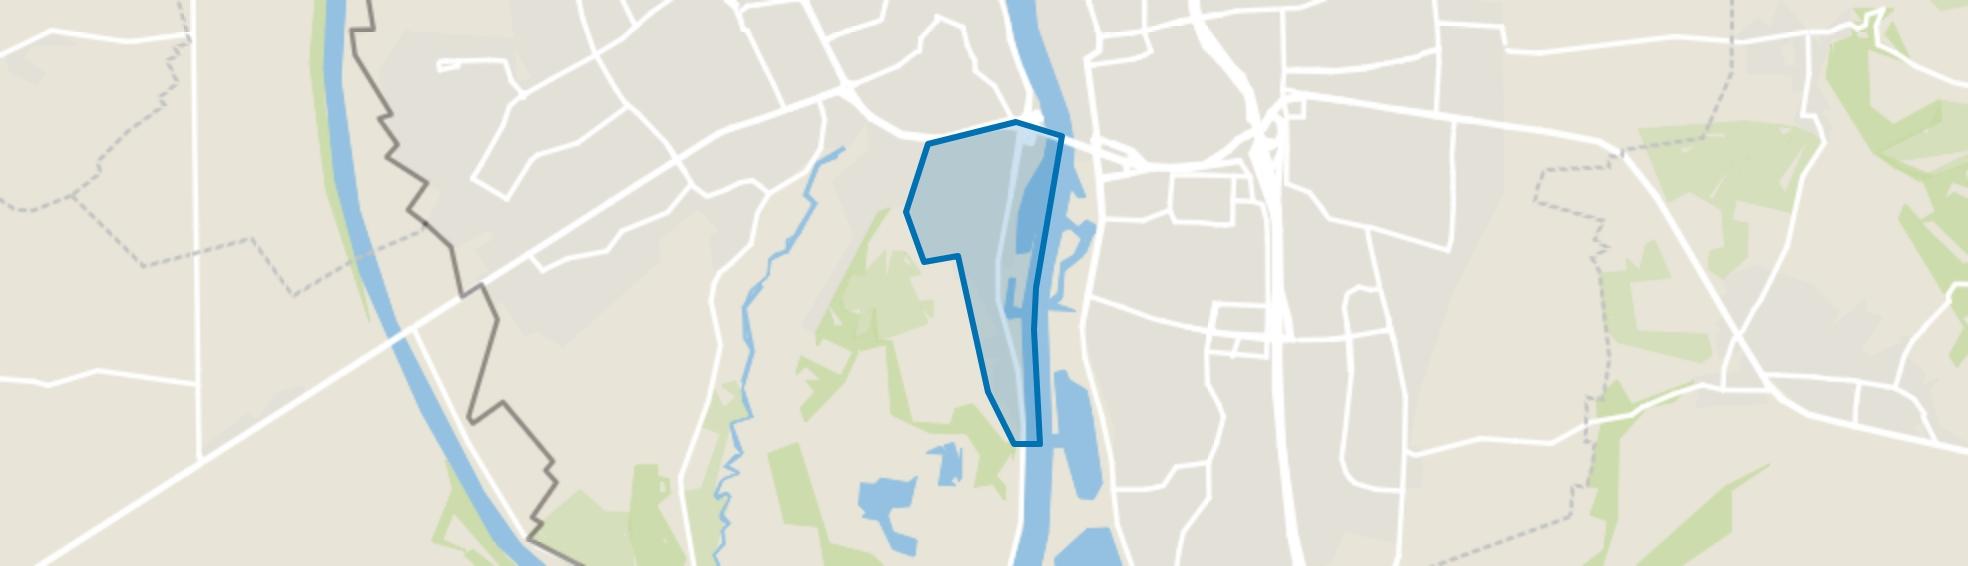 Villapark, Maastricht map